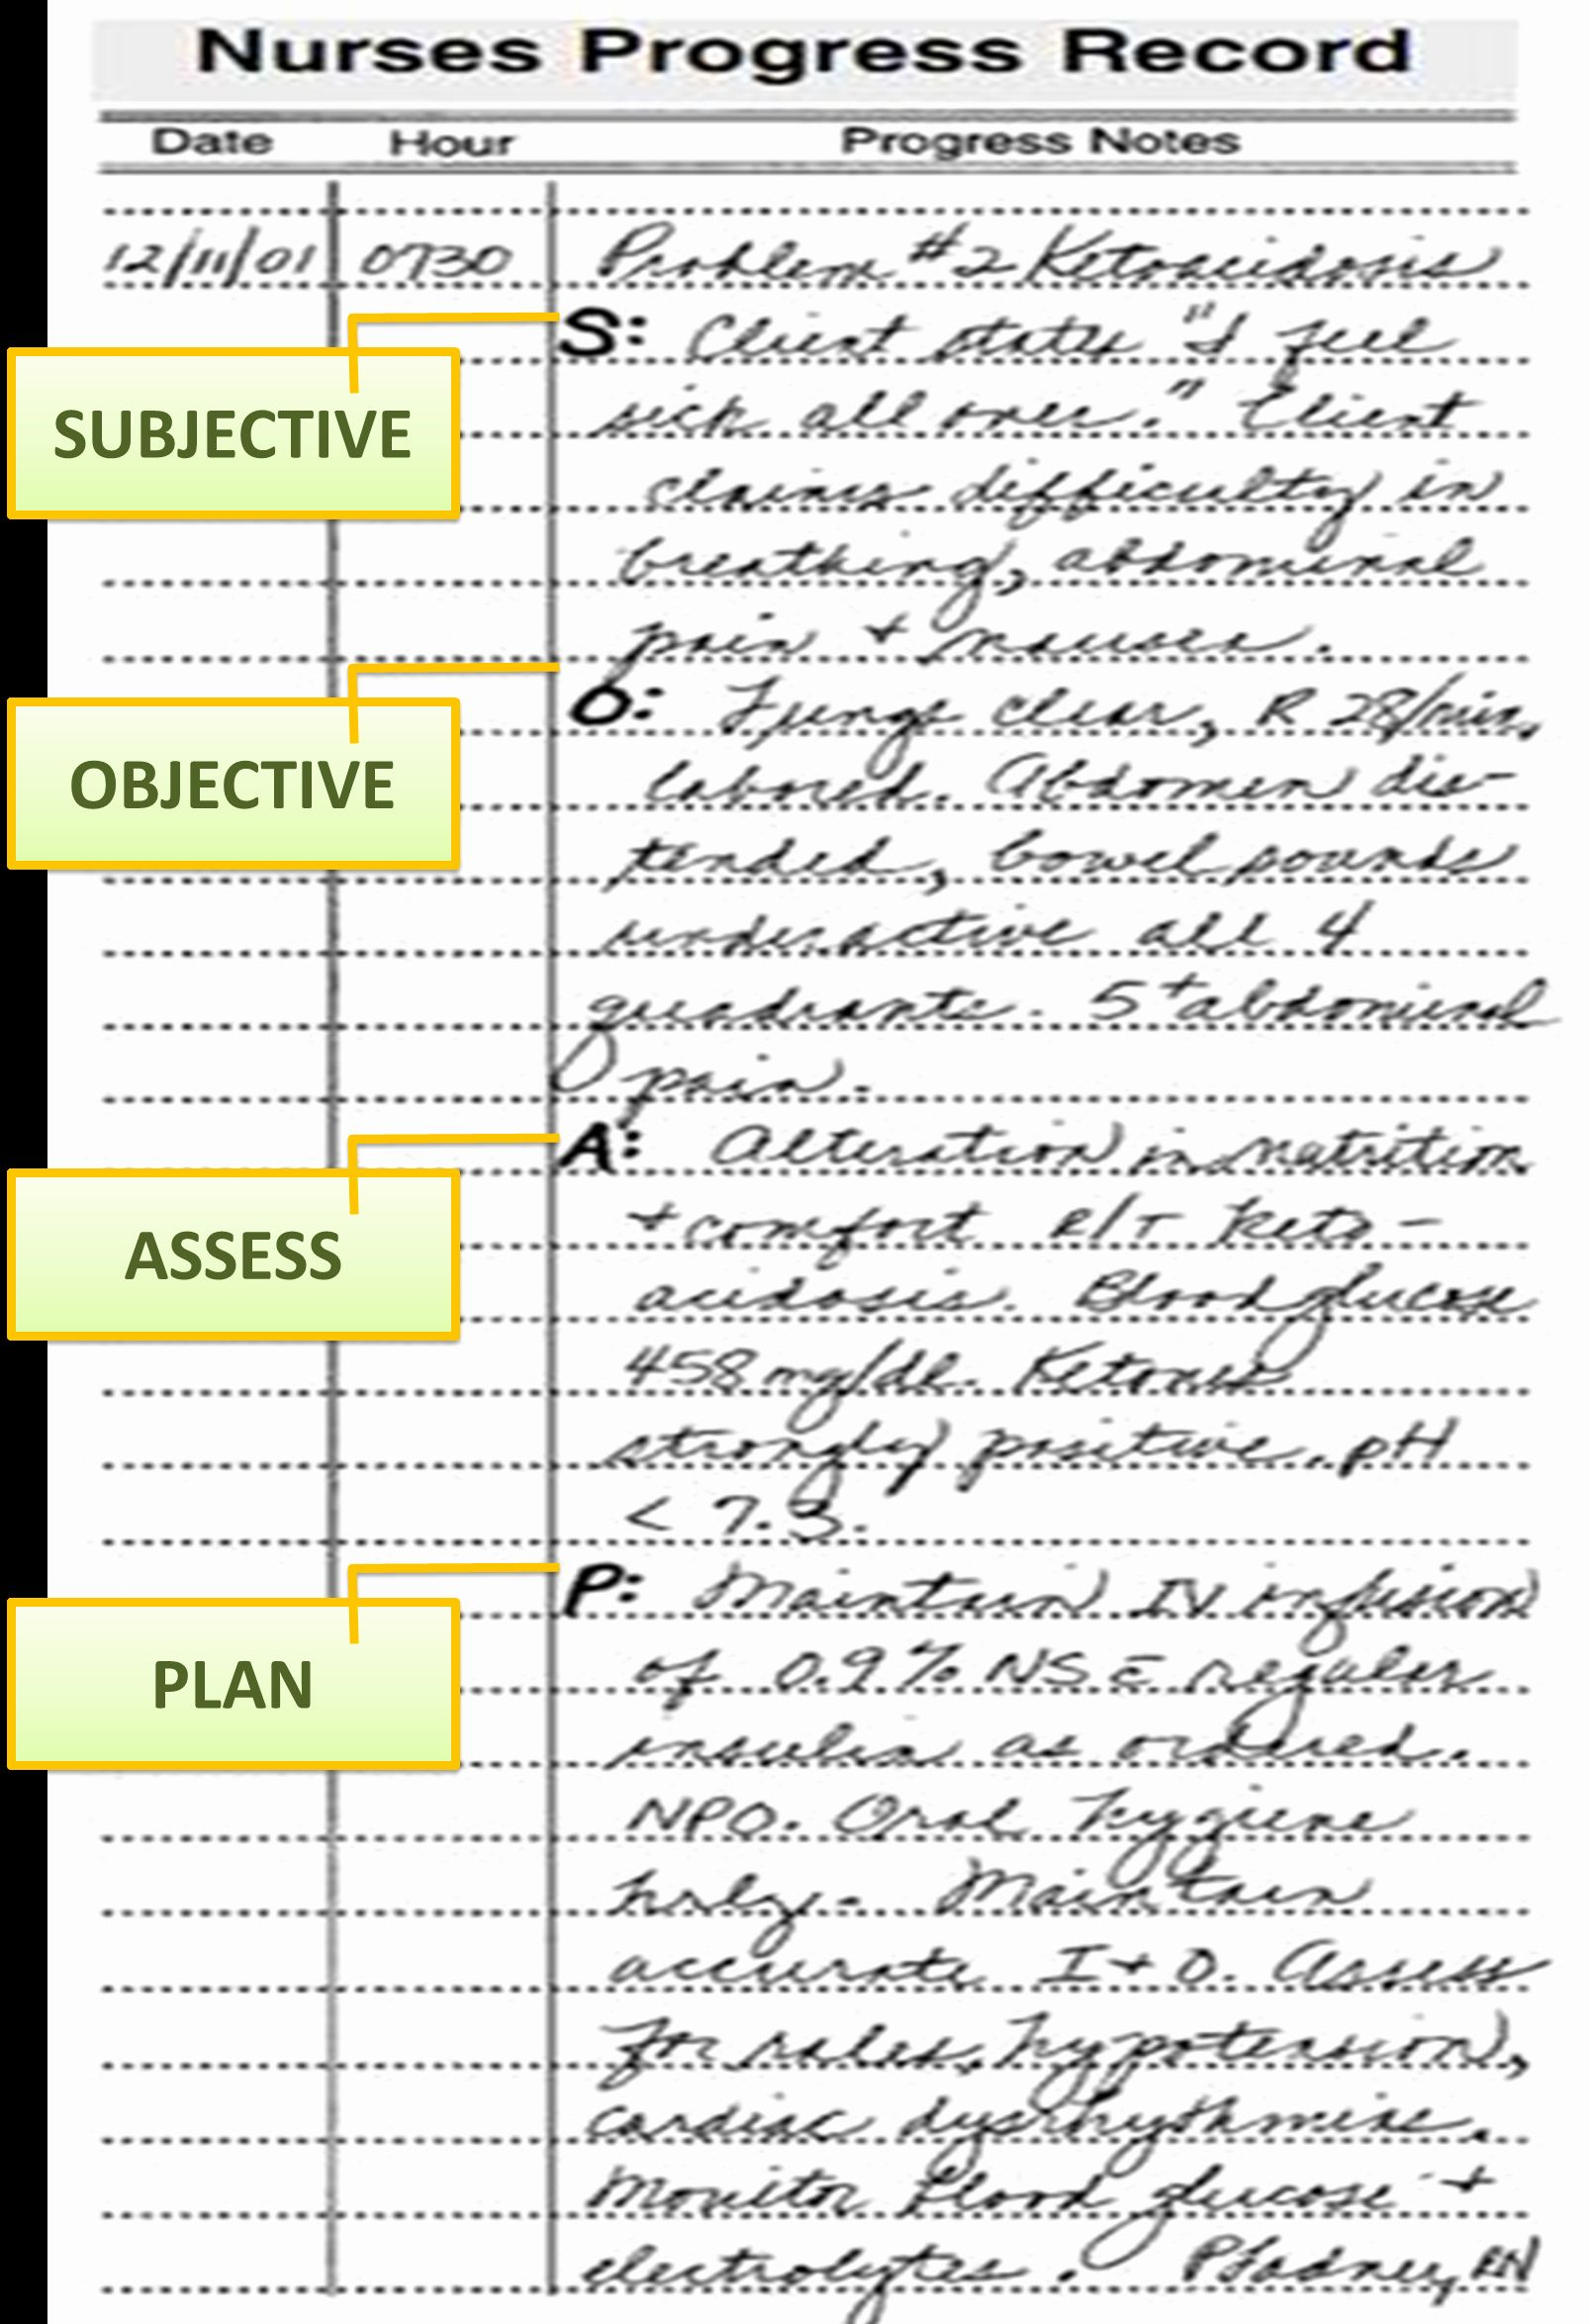 Soap Note Template Nurse Practitioner New Planning Patient Care Notes Template Nursing Notes Nursing Documentation Examples Free nursing progress notes template